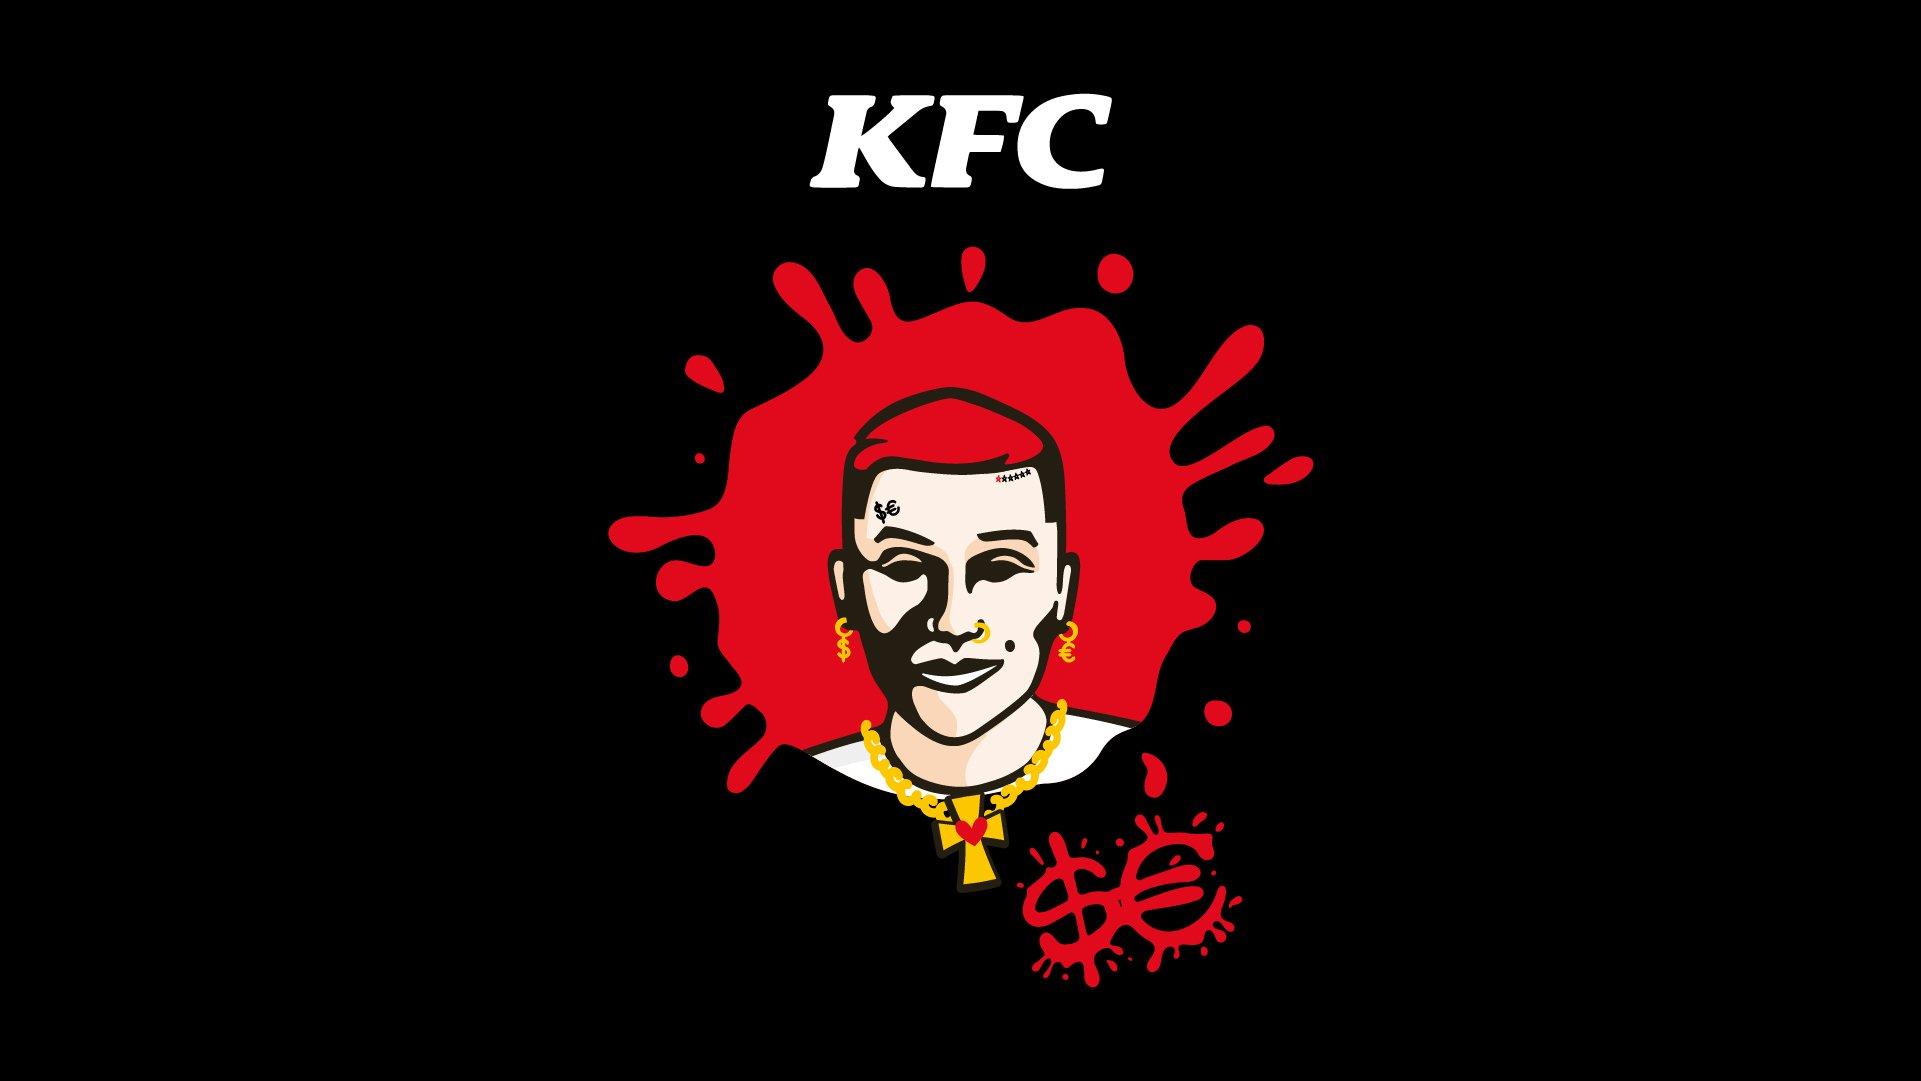 SFERA KFC MERCH 2020 graphics slider 01